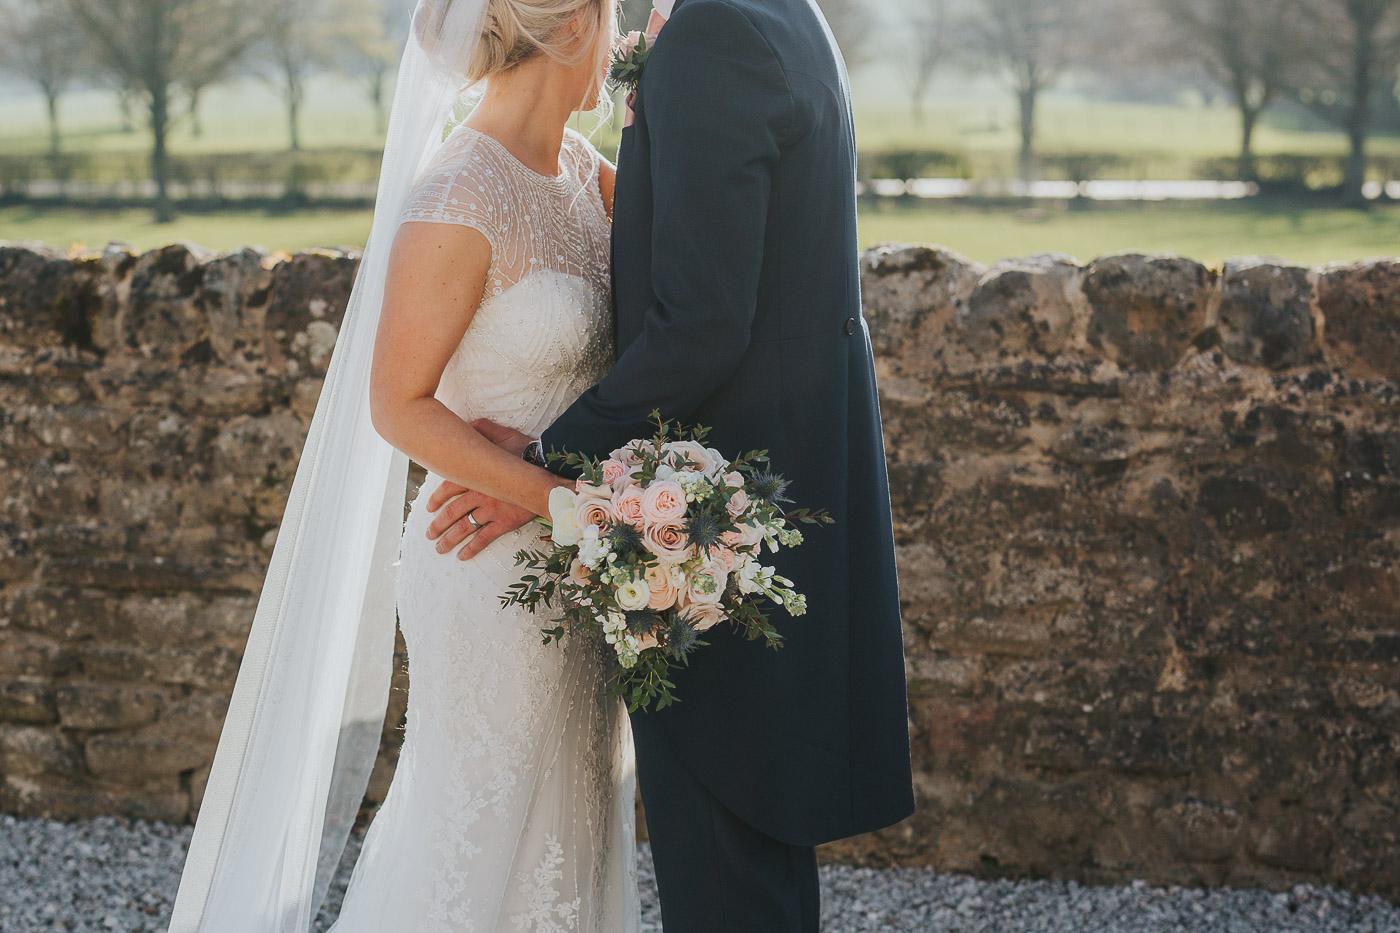 Tithe Barn - Laura Calderwood Photography - 29.3.19 - Mr & Mrs Lancaster290319-107.jpg